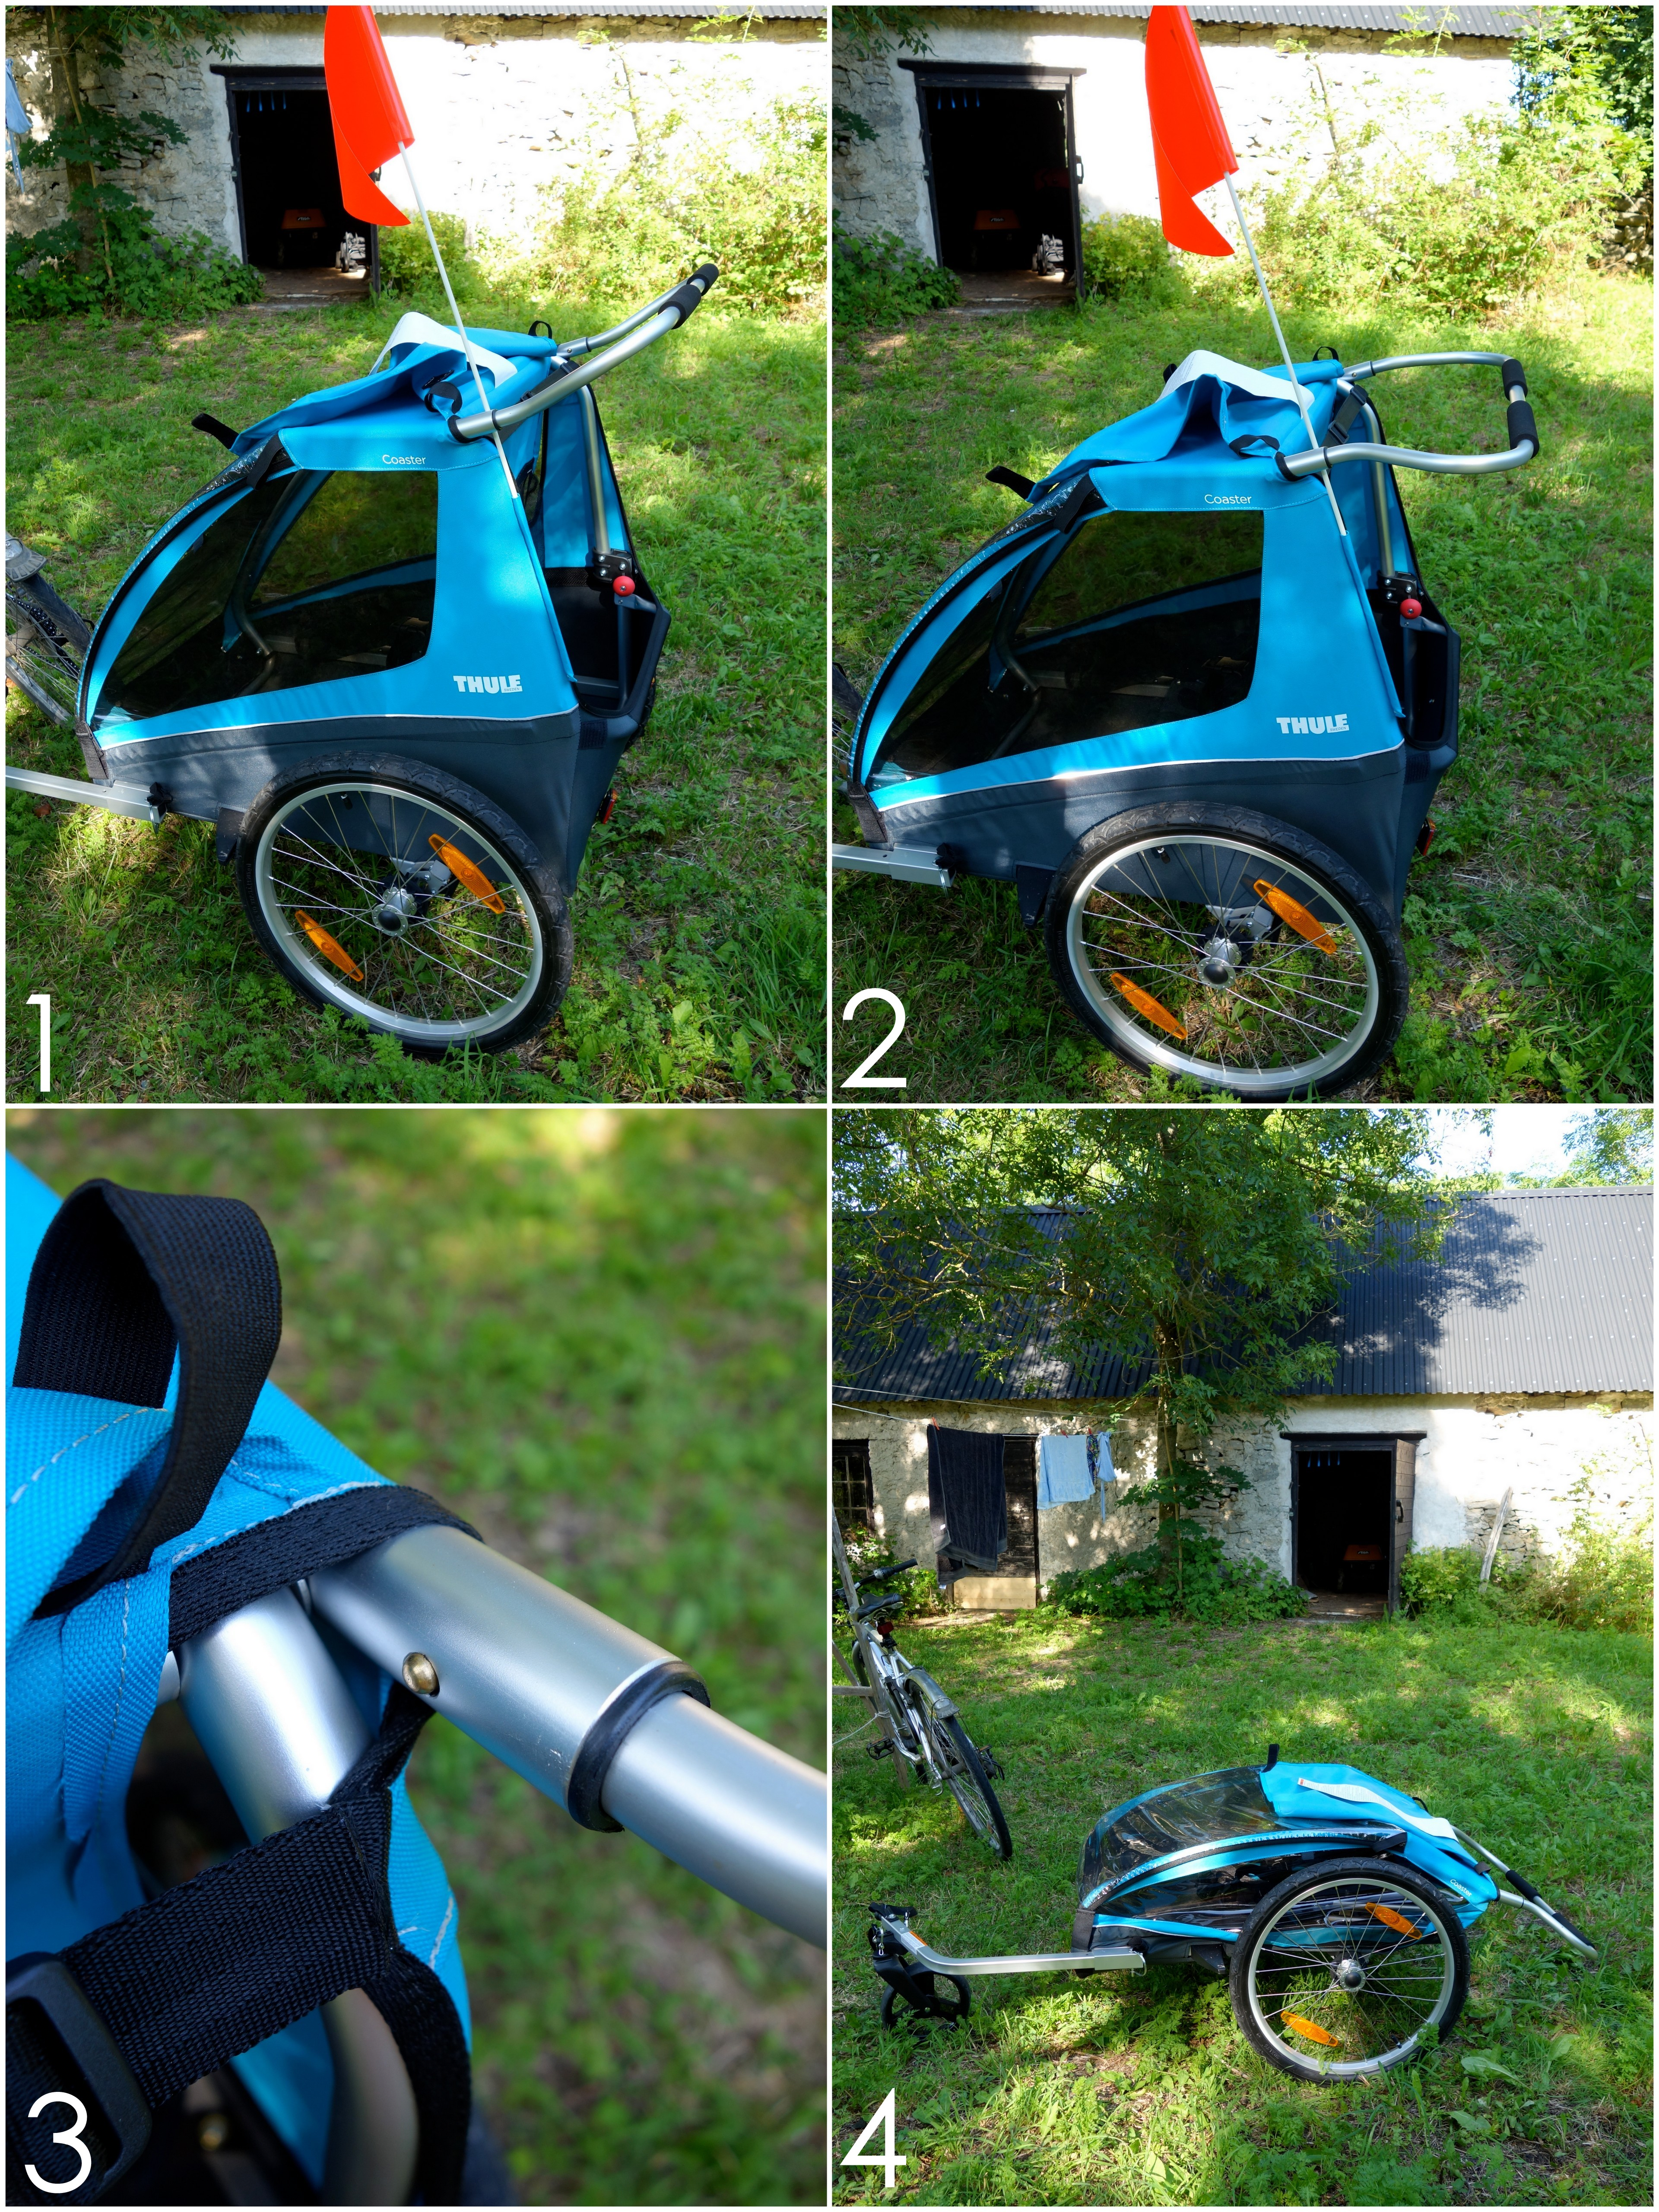 thule cykelvagn återförsäljare